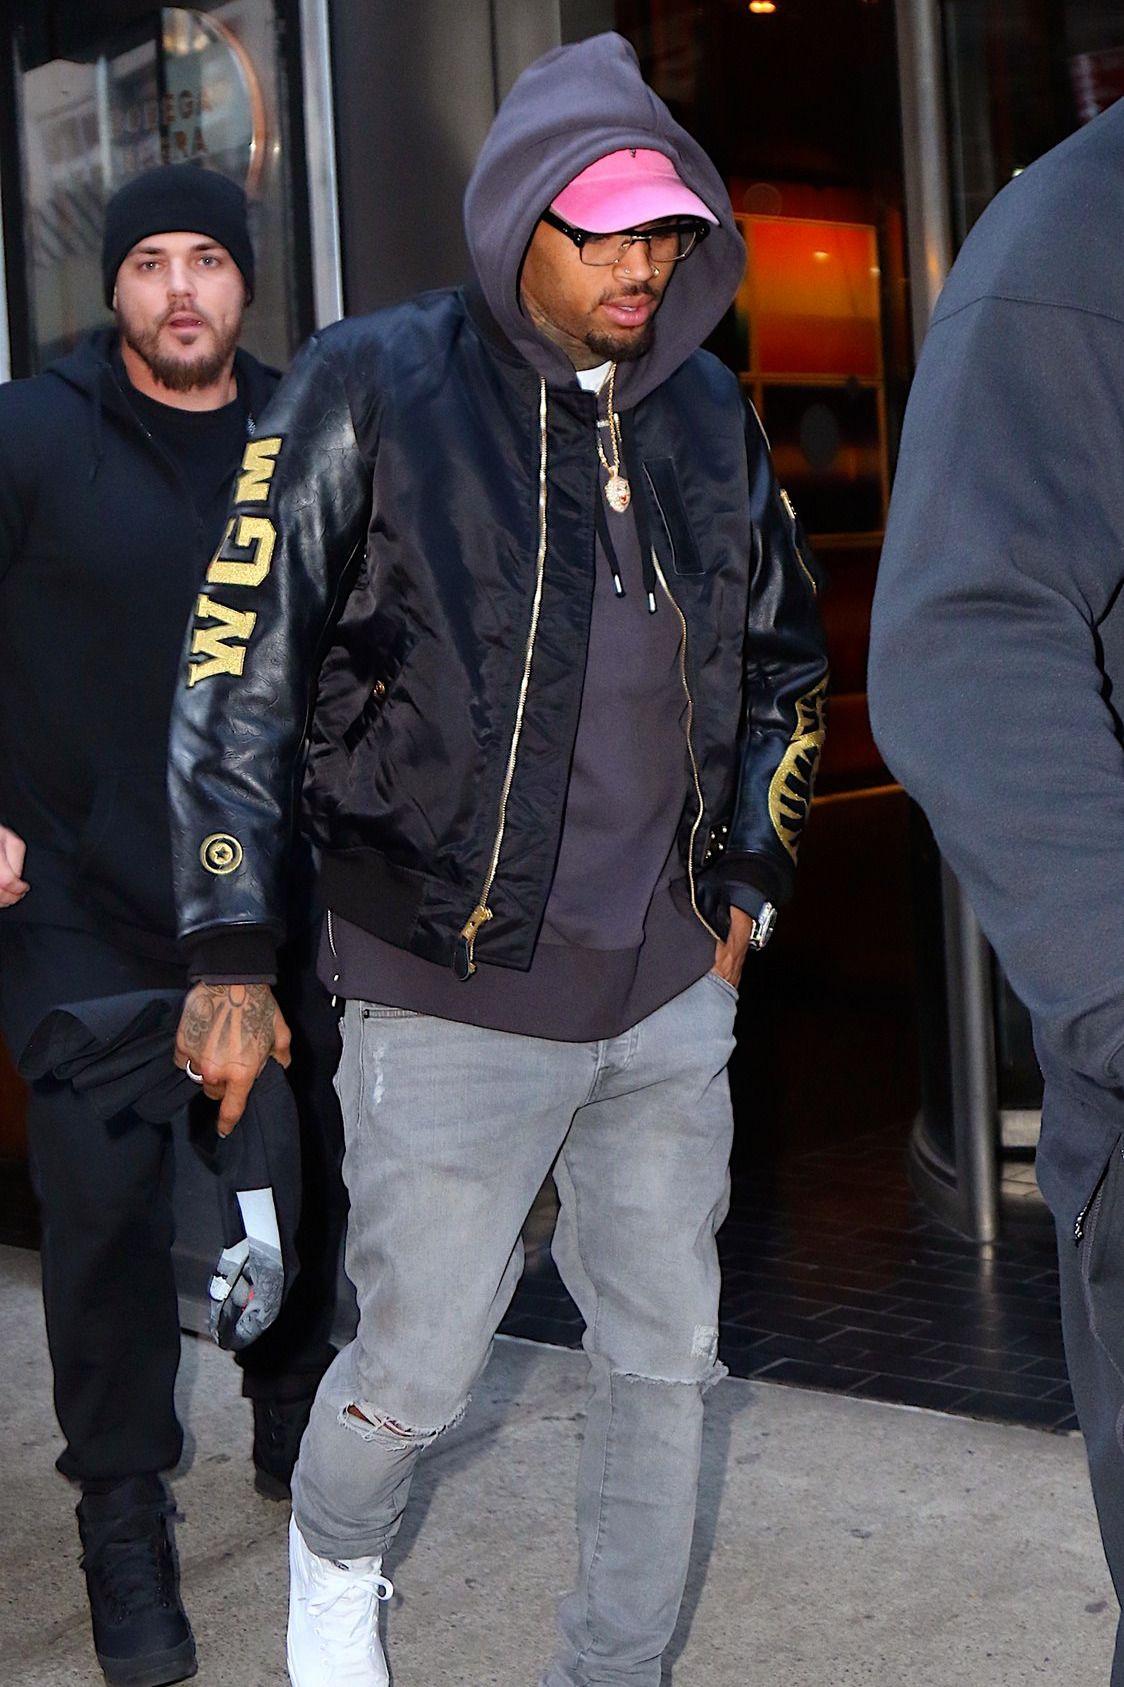 Chris Brown | Chris Brown | Pinterest | Chris brown, Brown ...